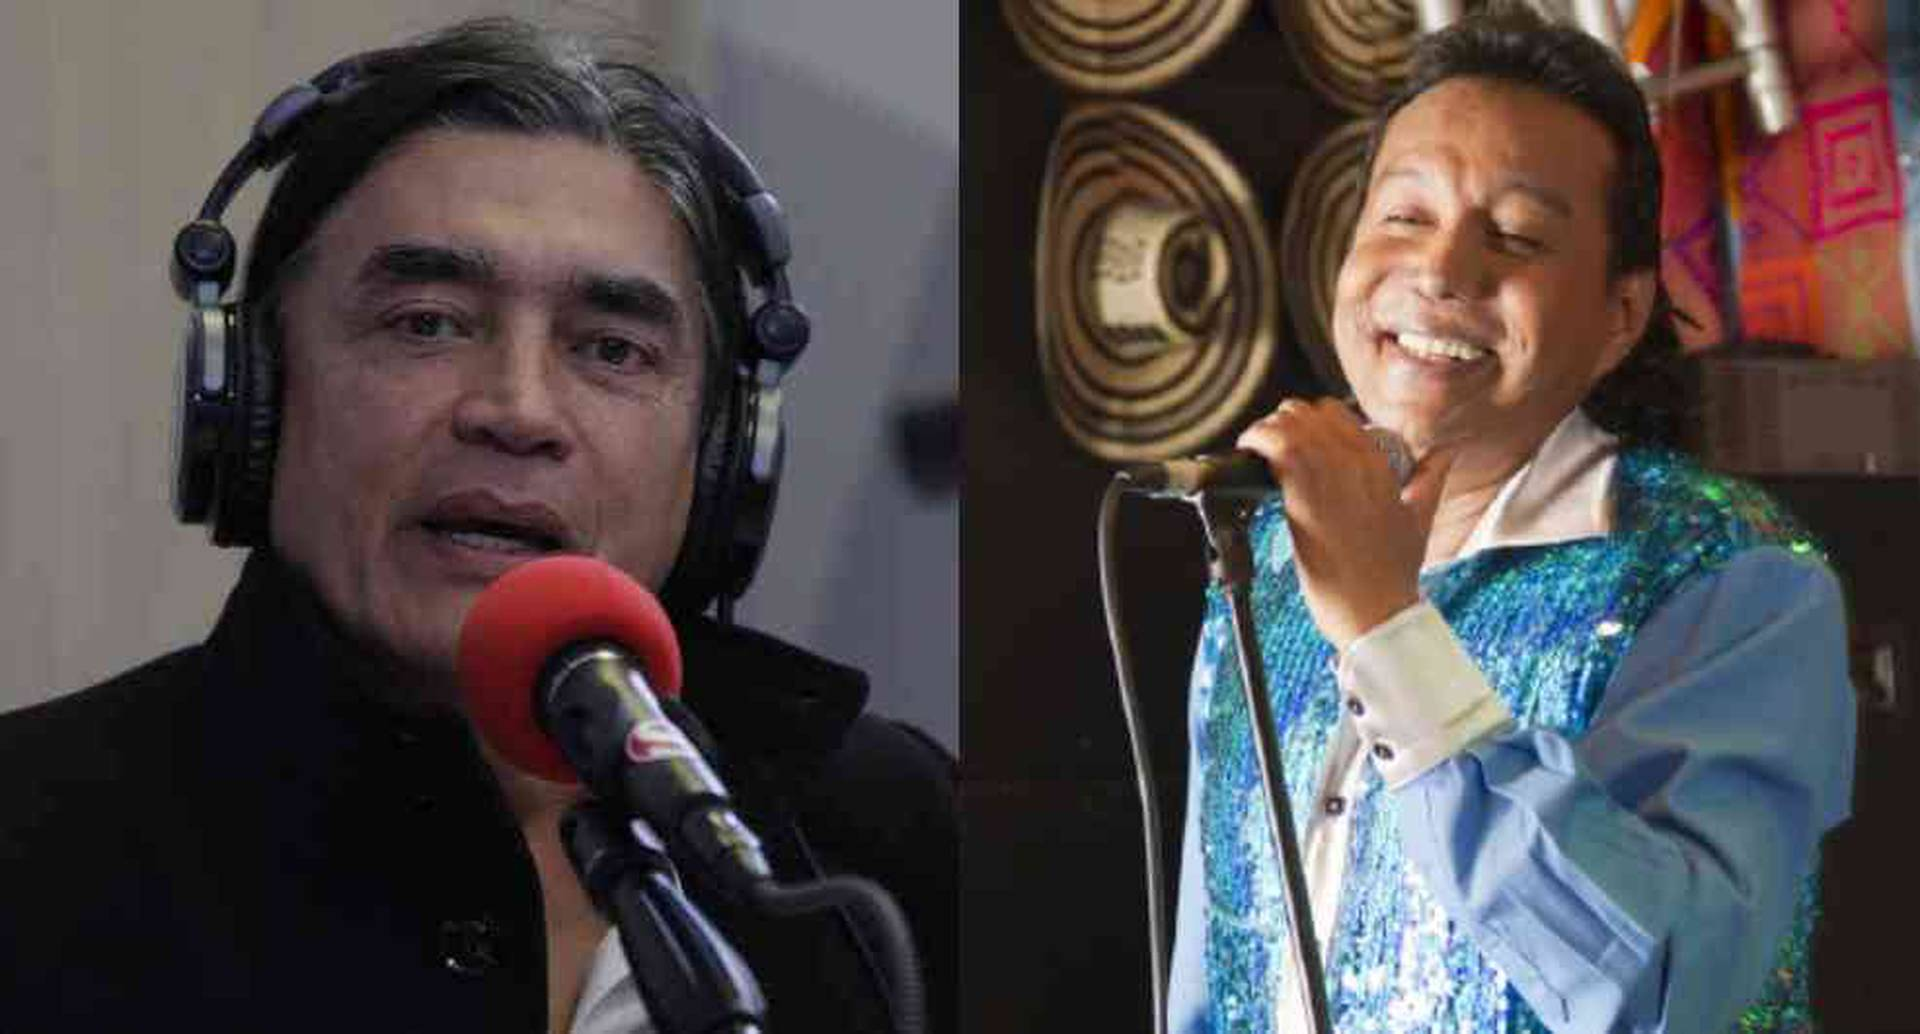 Familia de Diomedez Díaz exige disculpa pública de Gustavo Bolívar | Colombia hoy